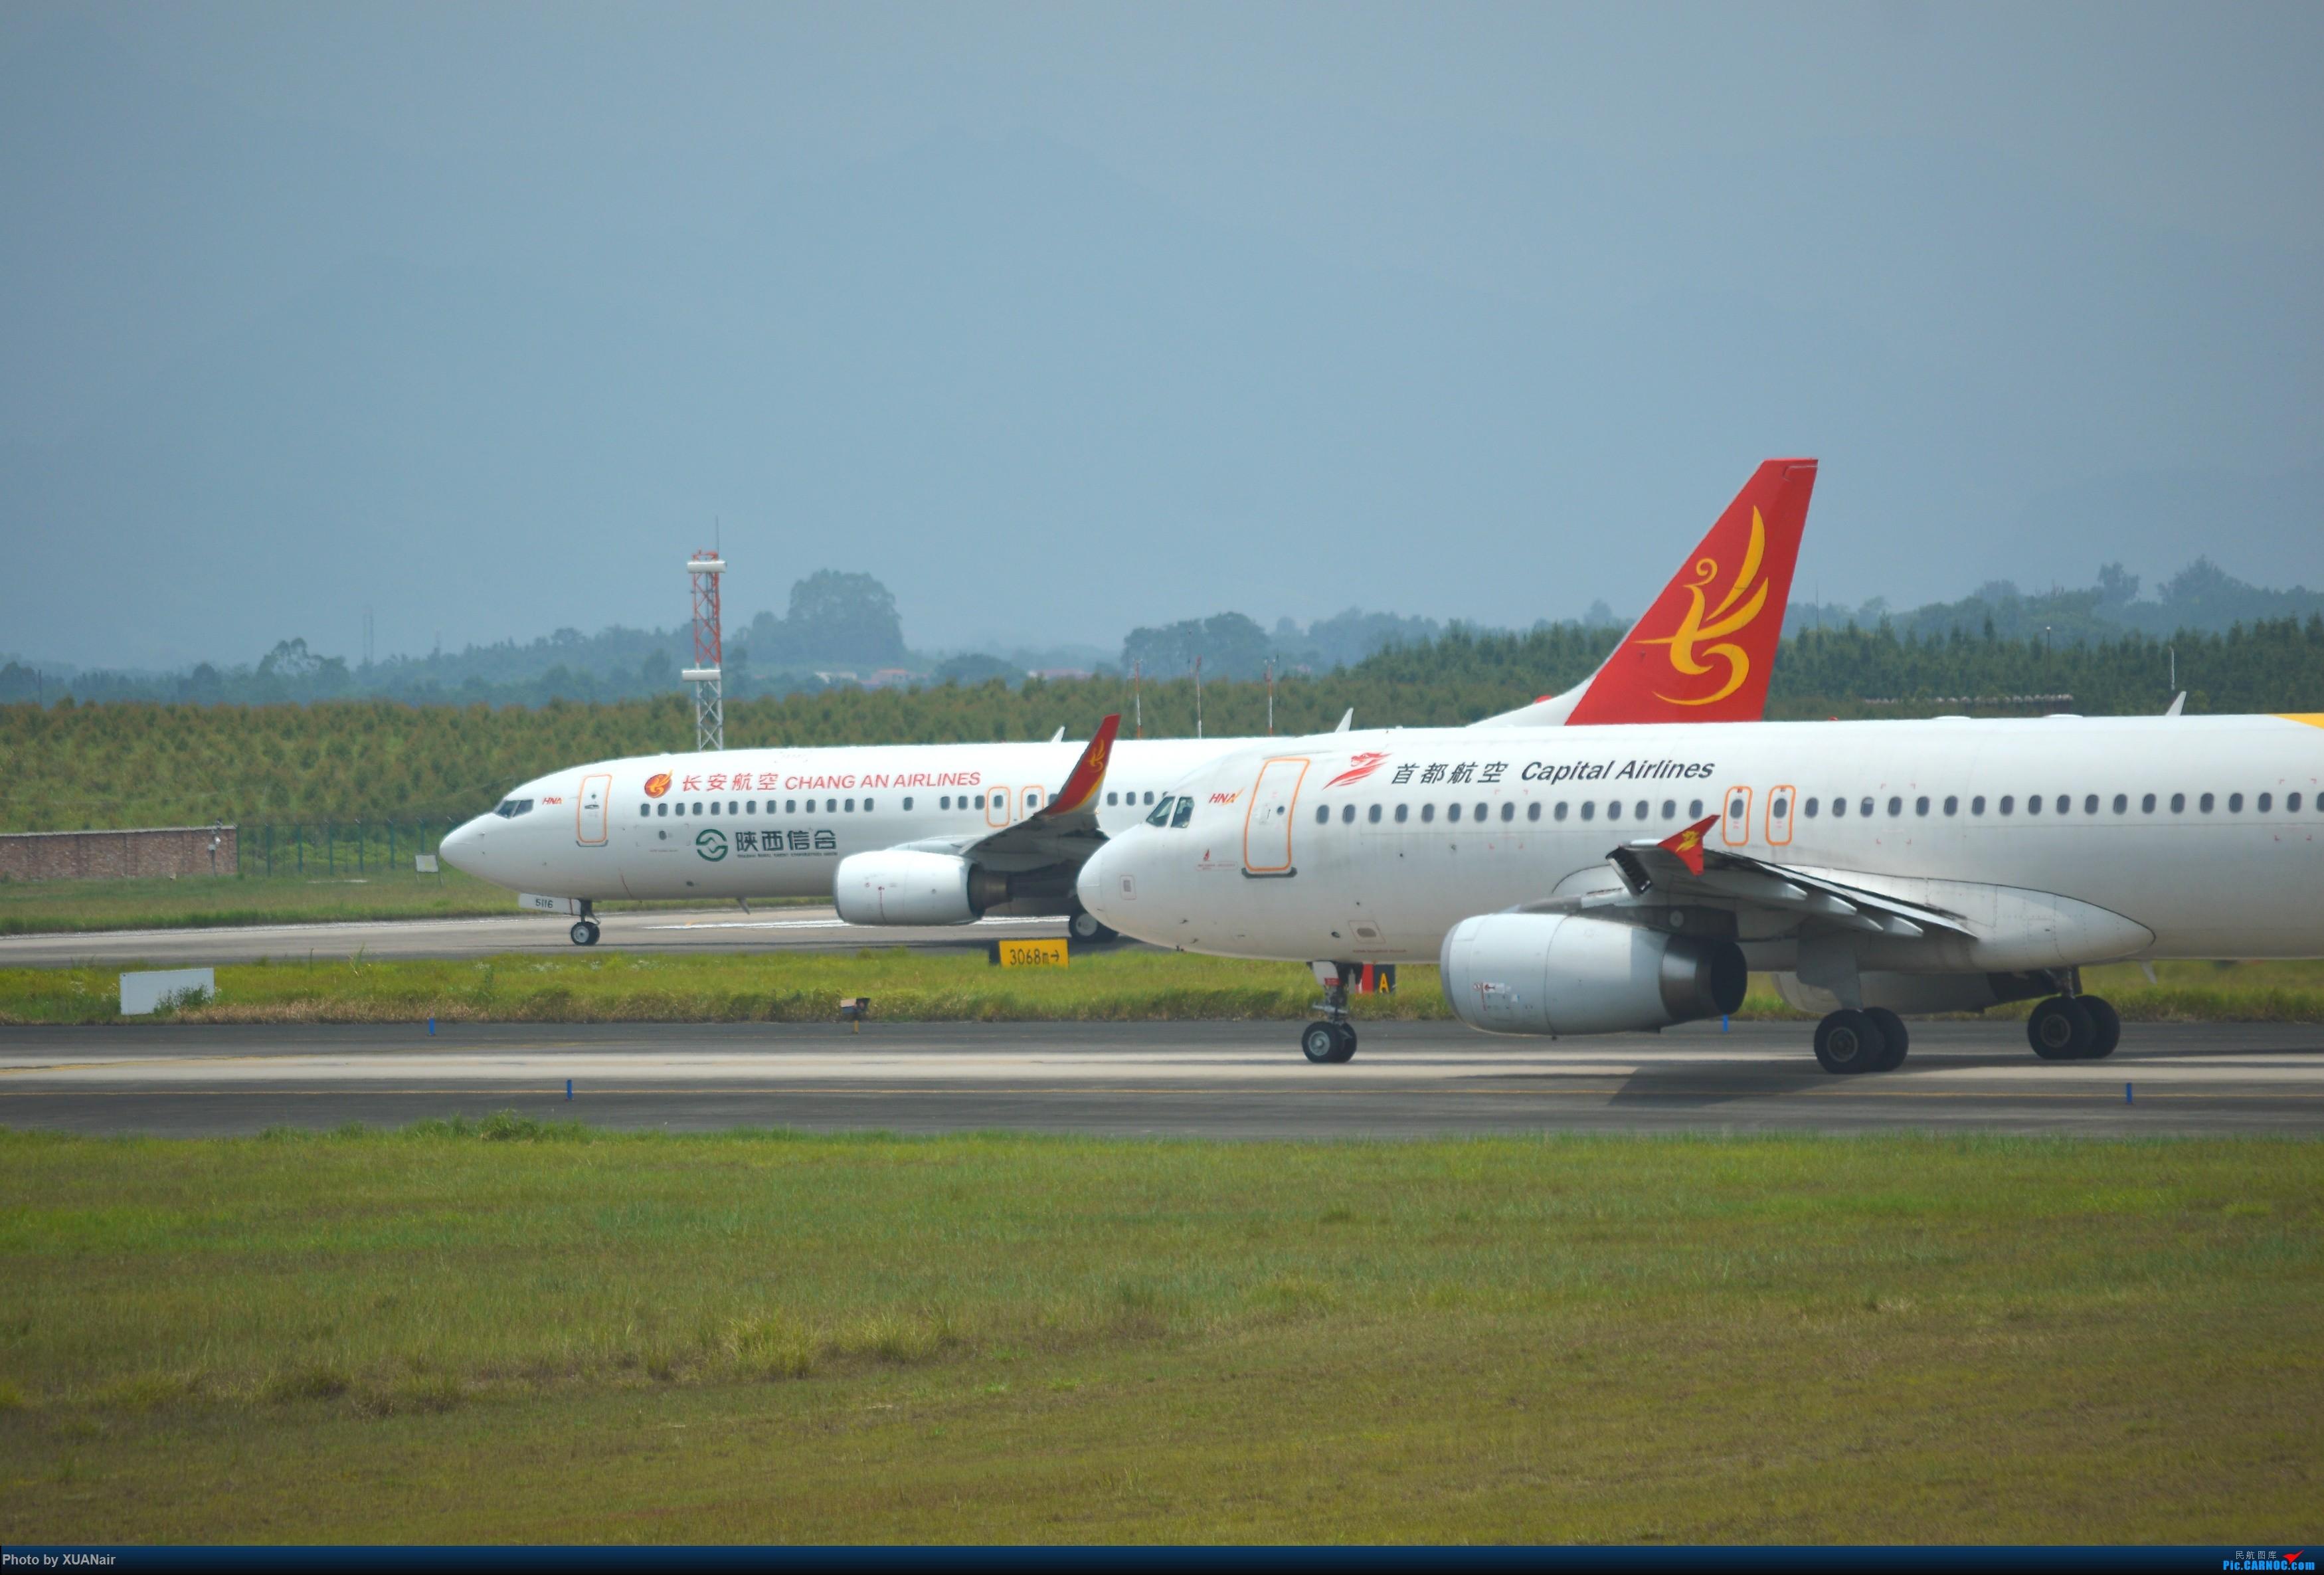 Re:[原创]桂林首都航空被长安航空插队起飞 BOEING 737-800 B-5116 中国桂林两江国际机场